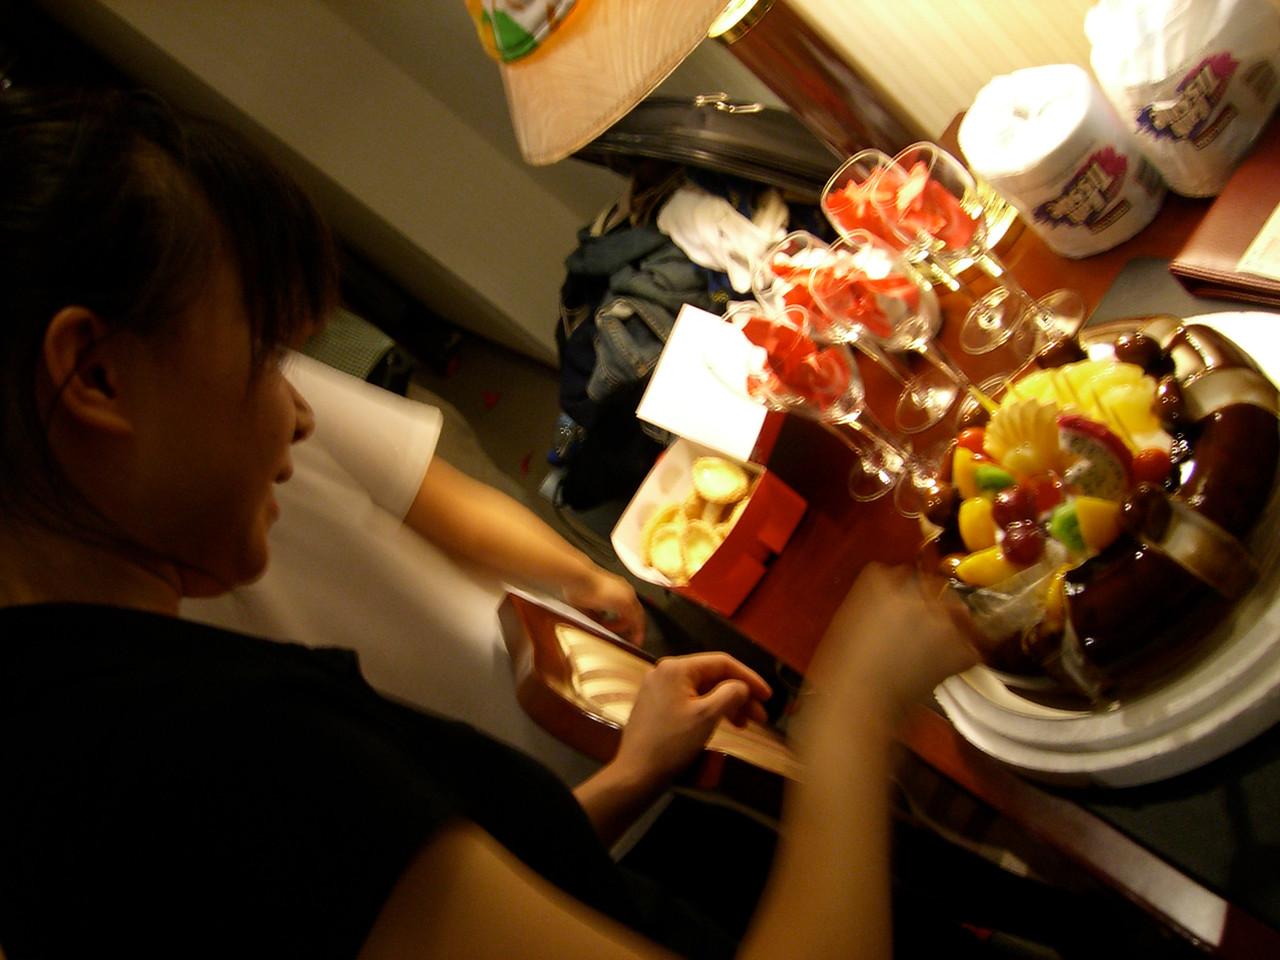 2006 07 15 Sat - Alice Tung's surprise b-day cake 3